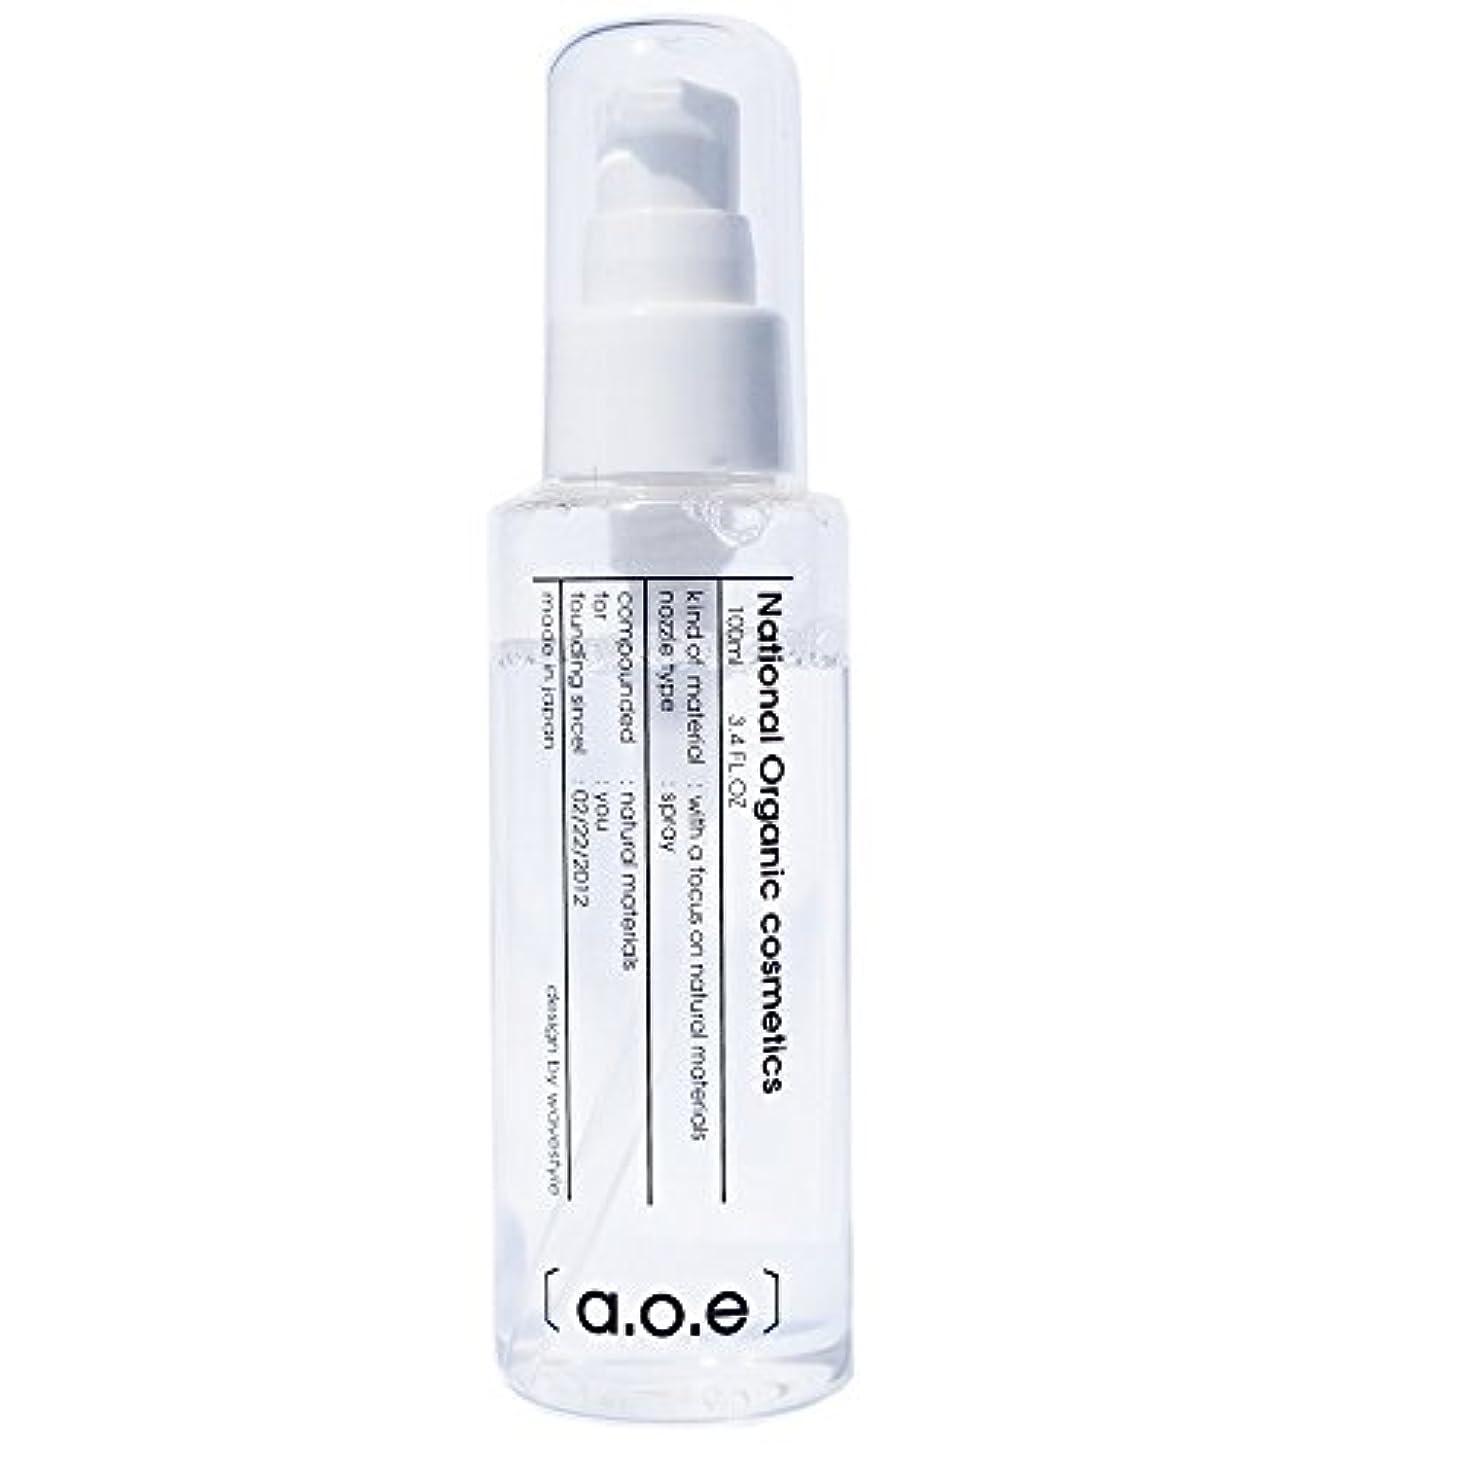 aoe 【ハーバル美容液配合】<肌が弱い方用:敏感性乾燥肌>ブーストトナー【 オーガニック 化粧水 】